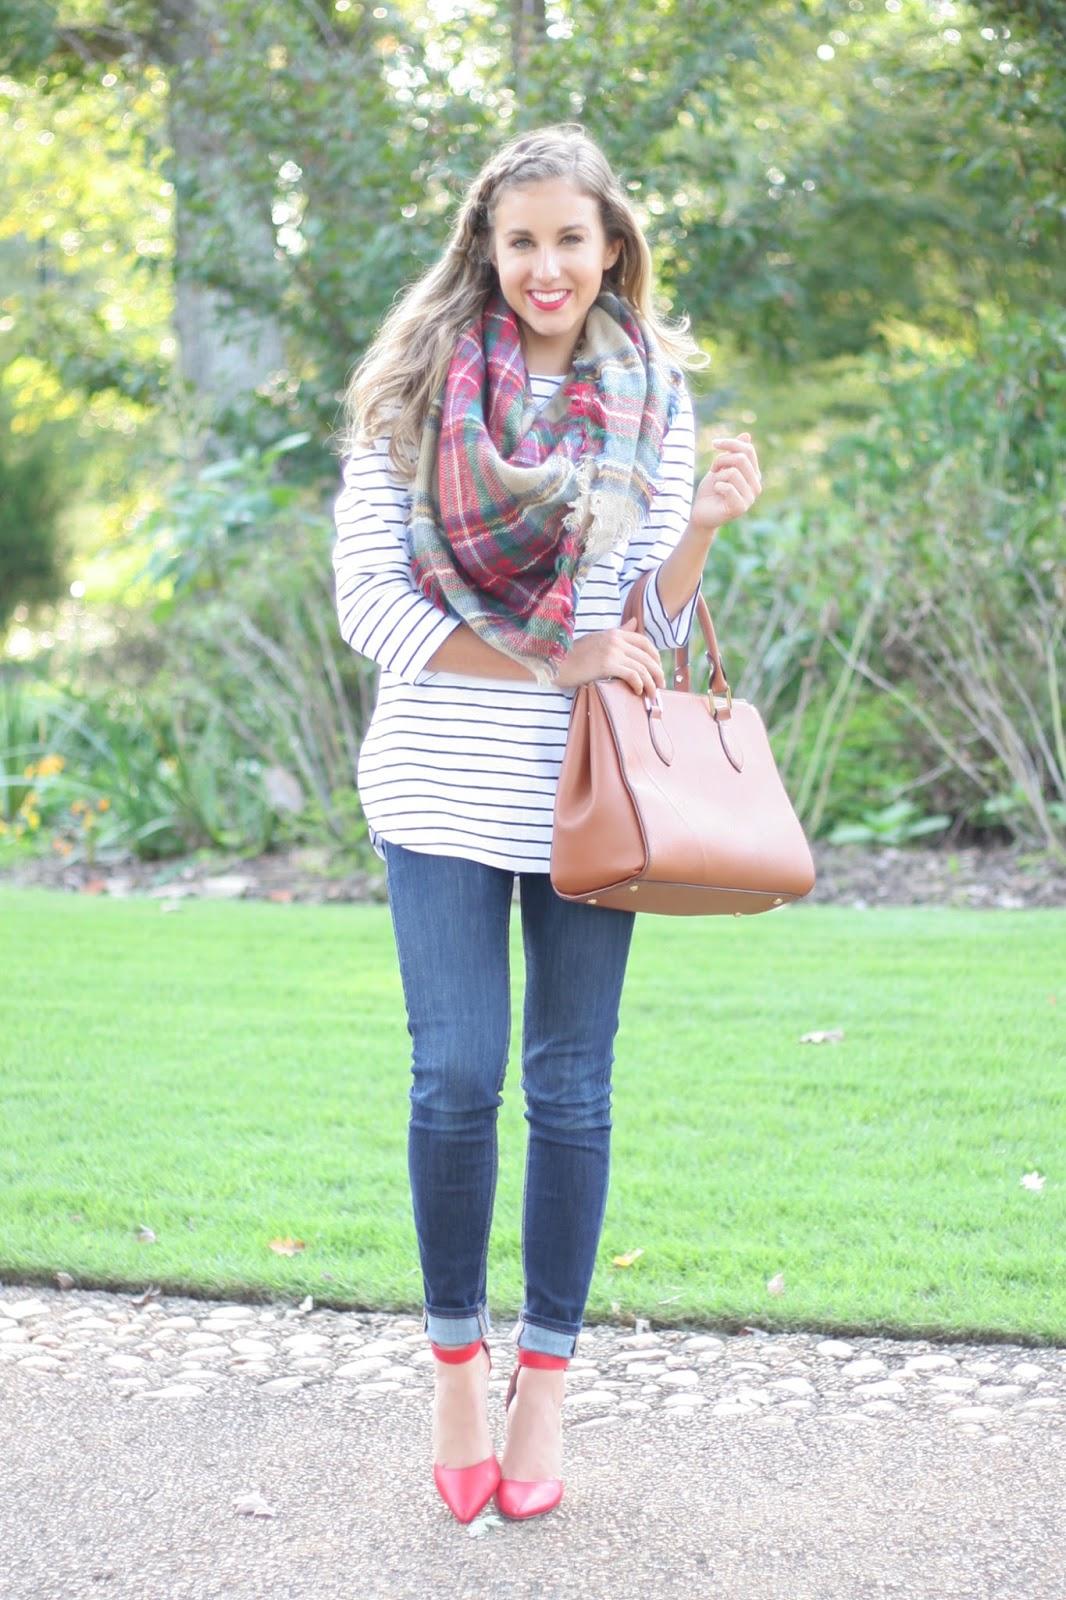 Layering Prints: Stripes & A Plaid Blanket Scarf